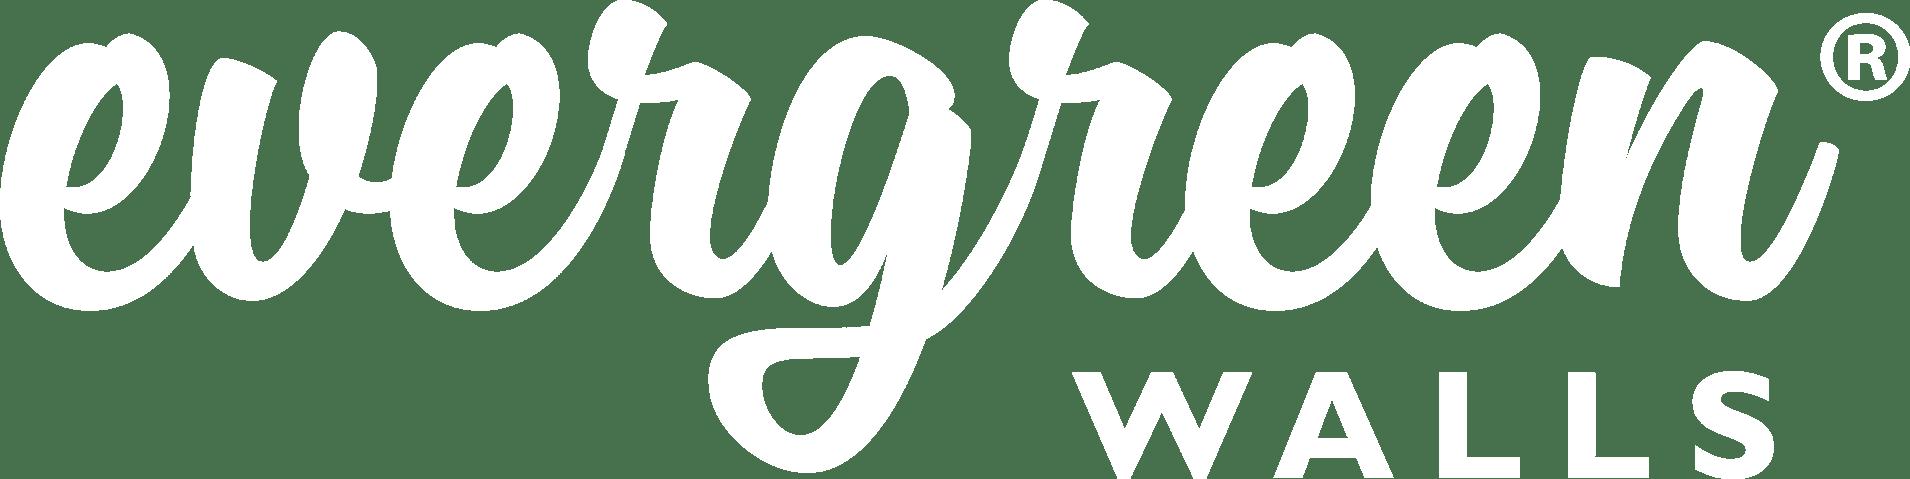 Evergreen Walls Logo R white